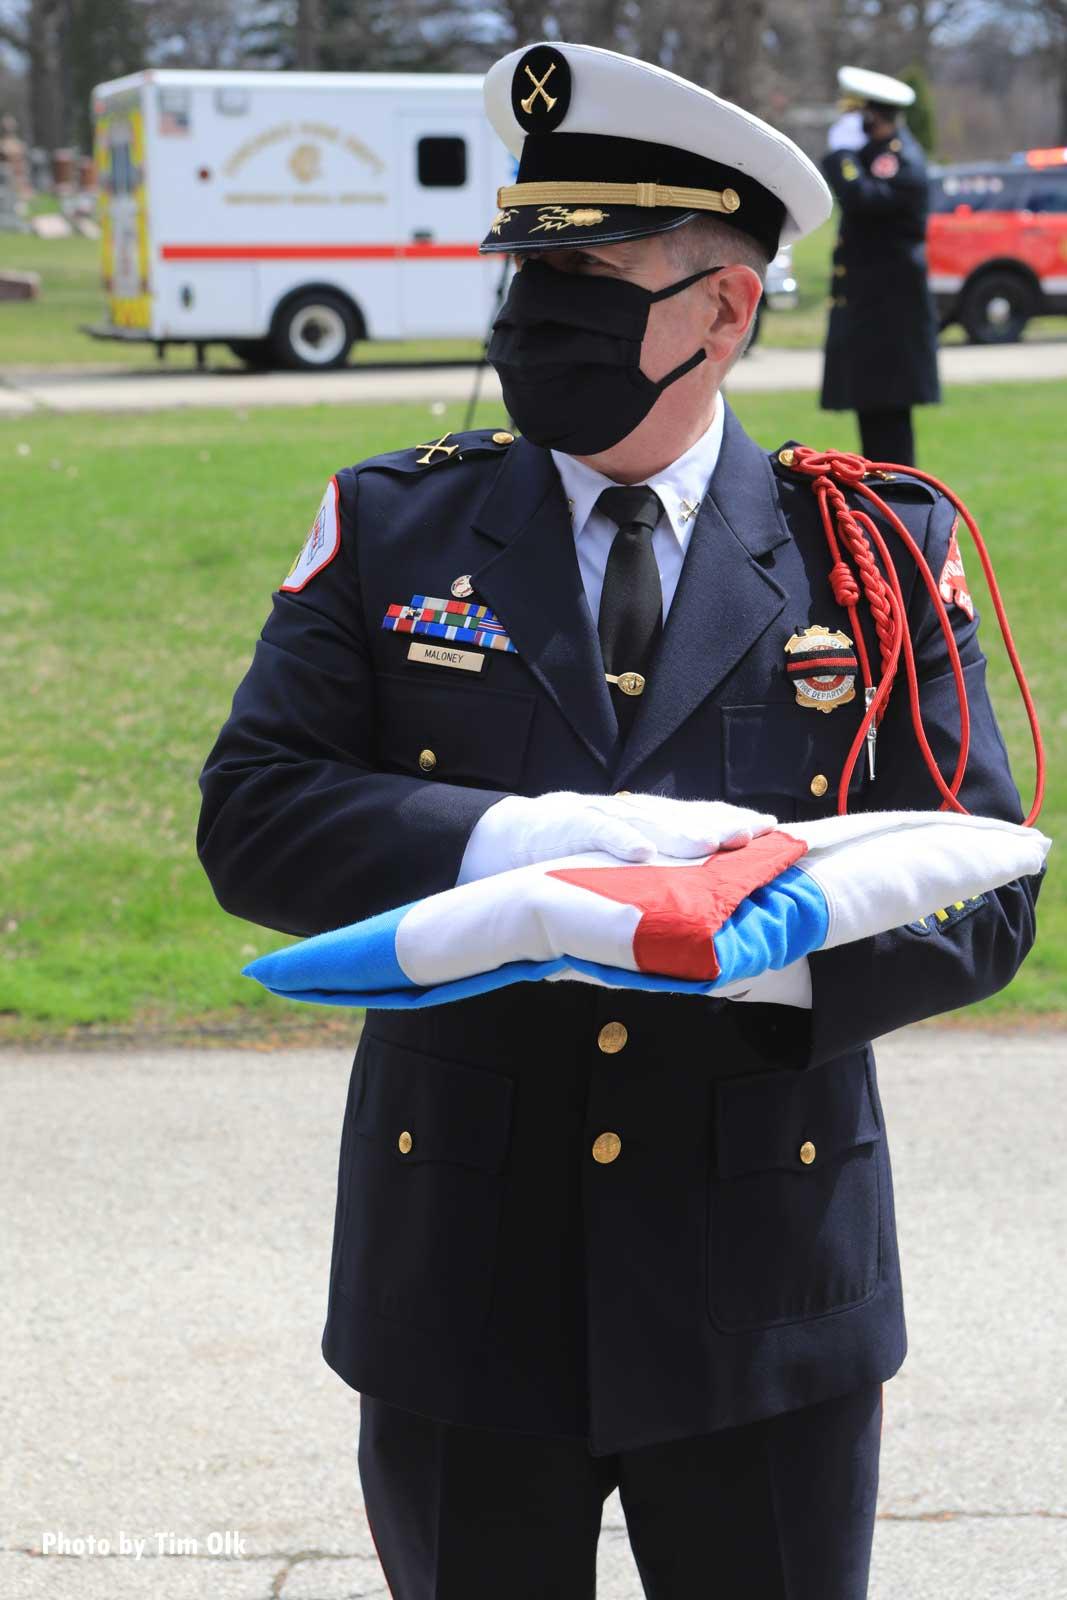 Firefighter bearing a flag